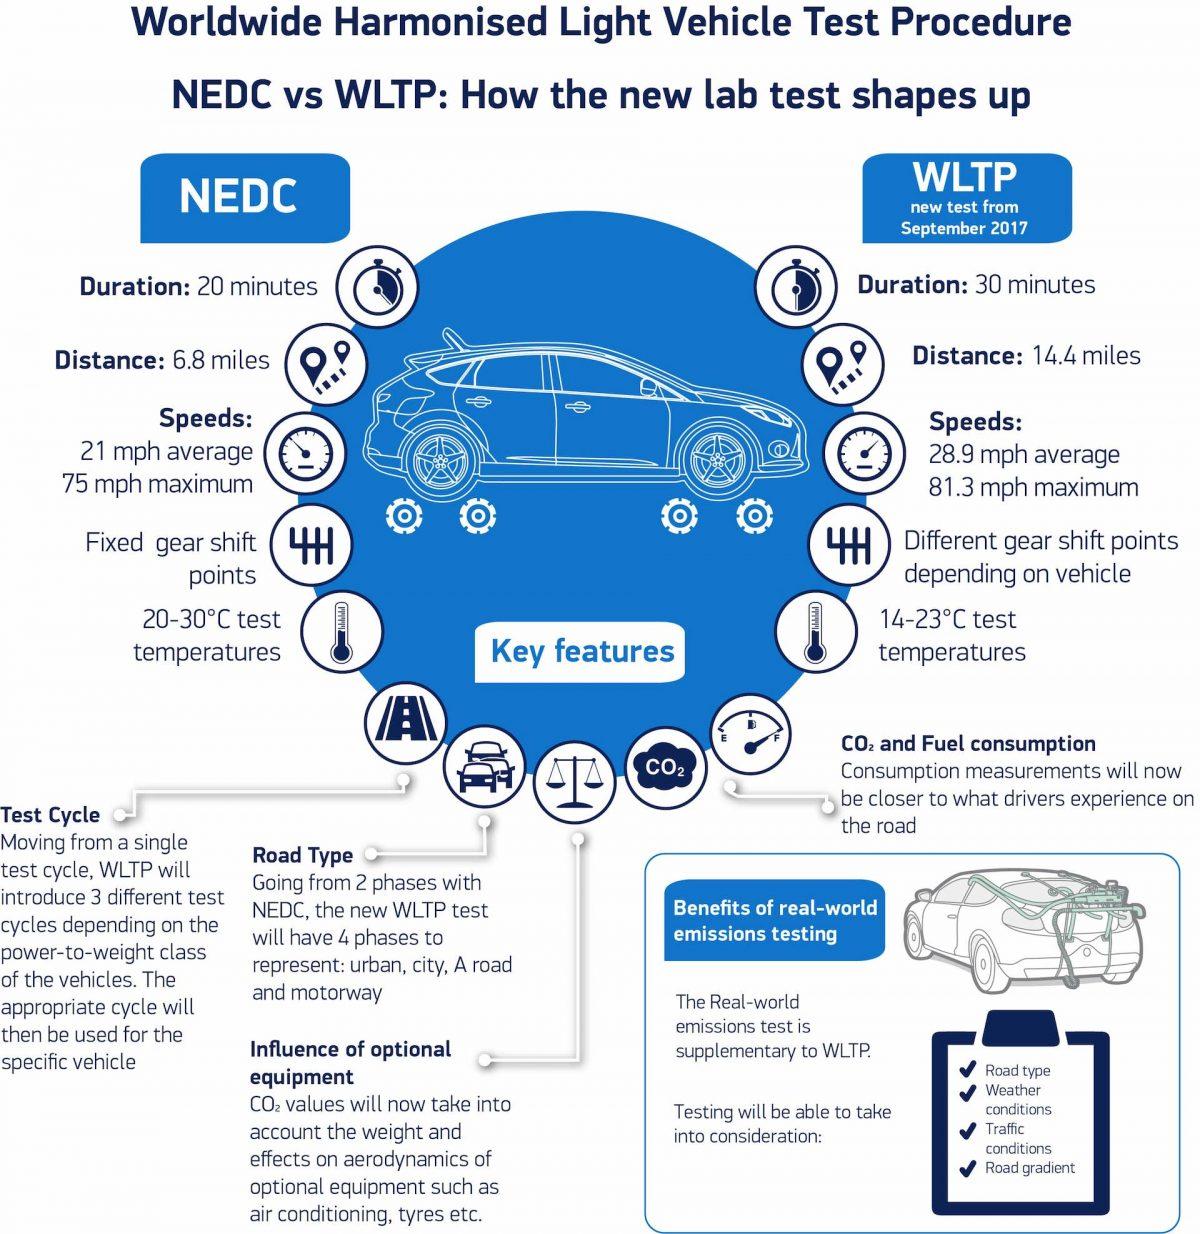 WLTP vs NEDC emissions testing